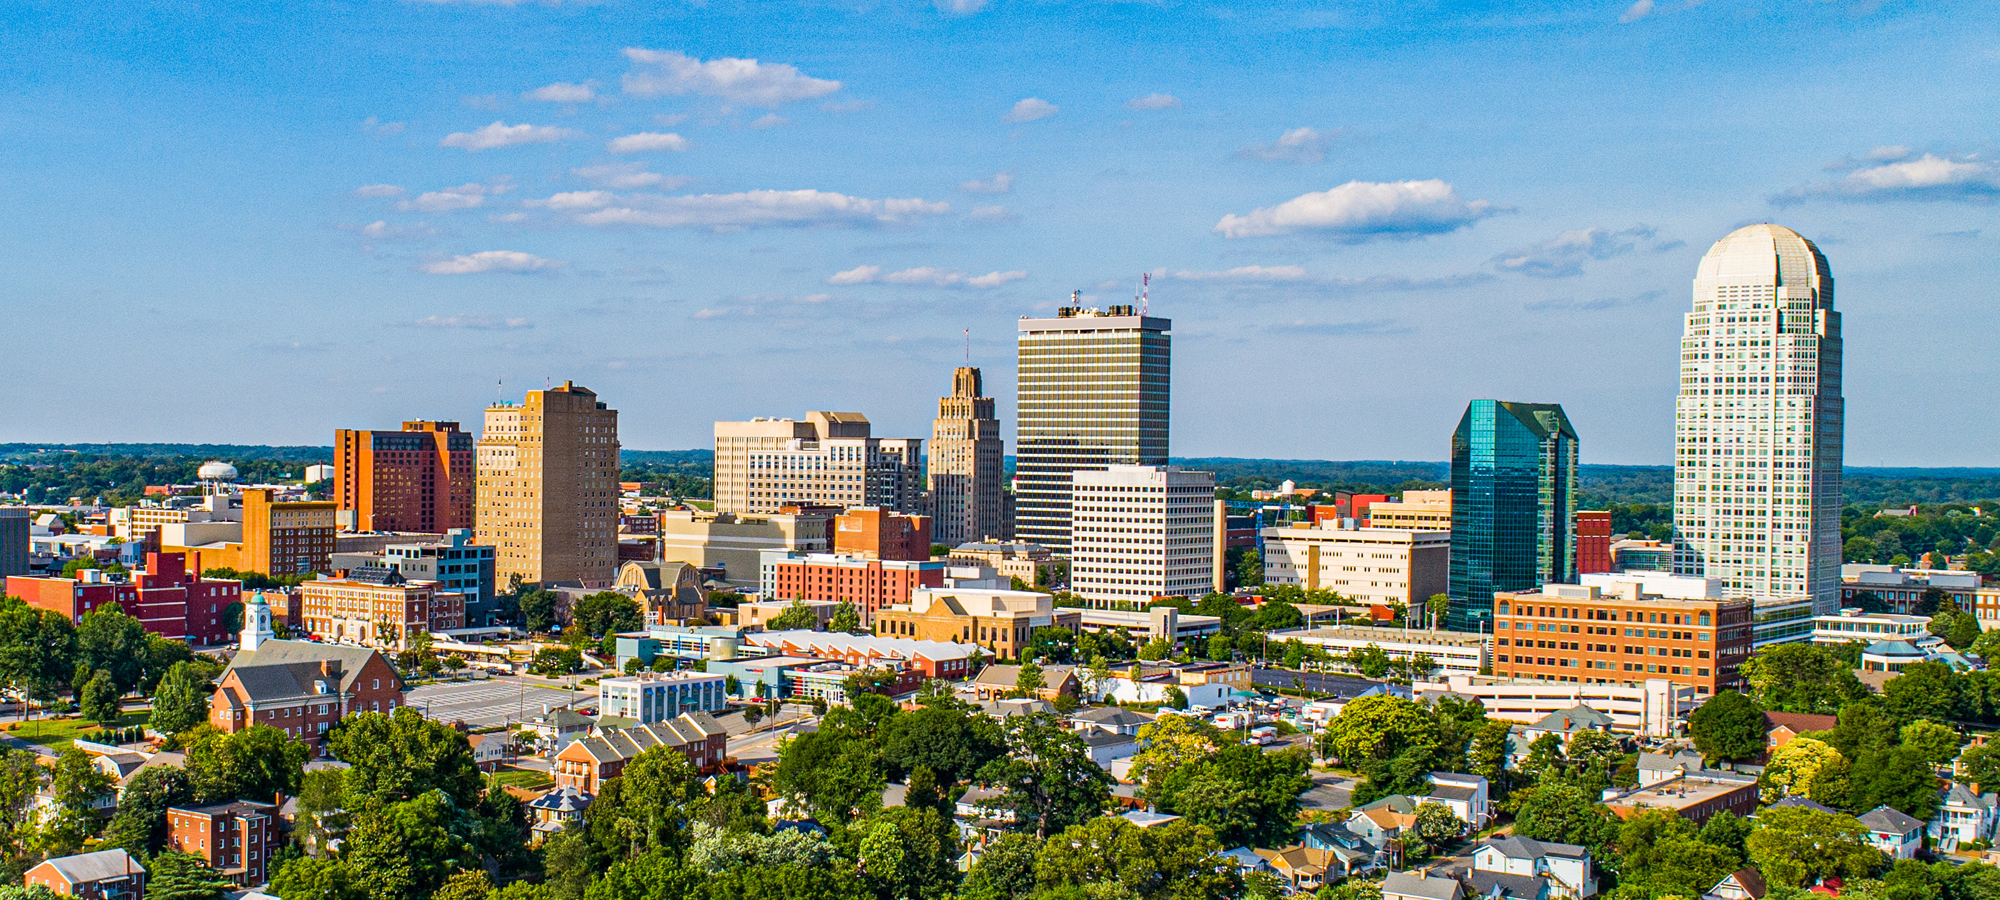 WinstonSalem NC skyline